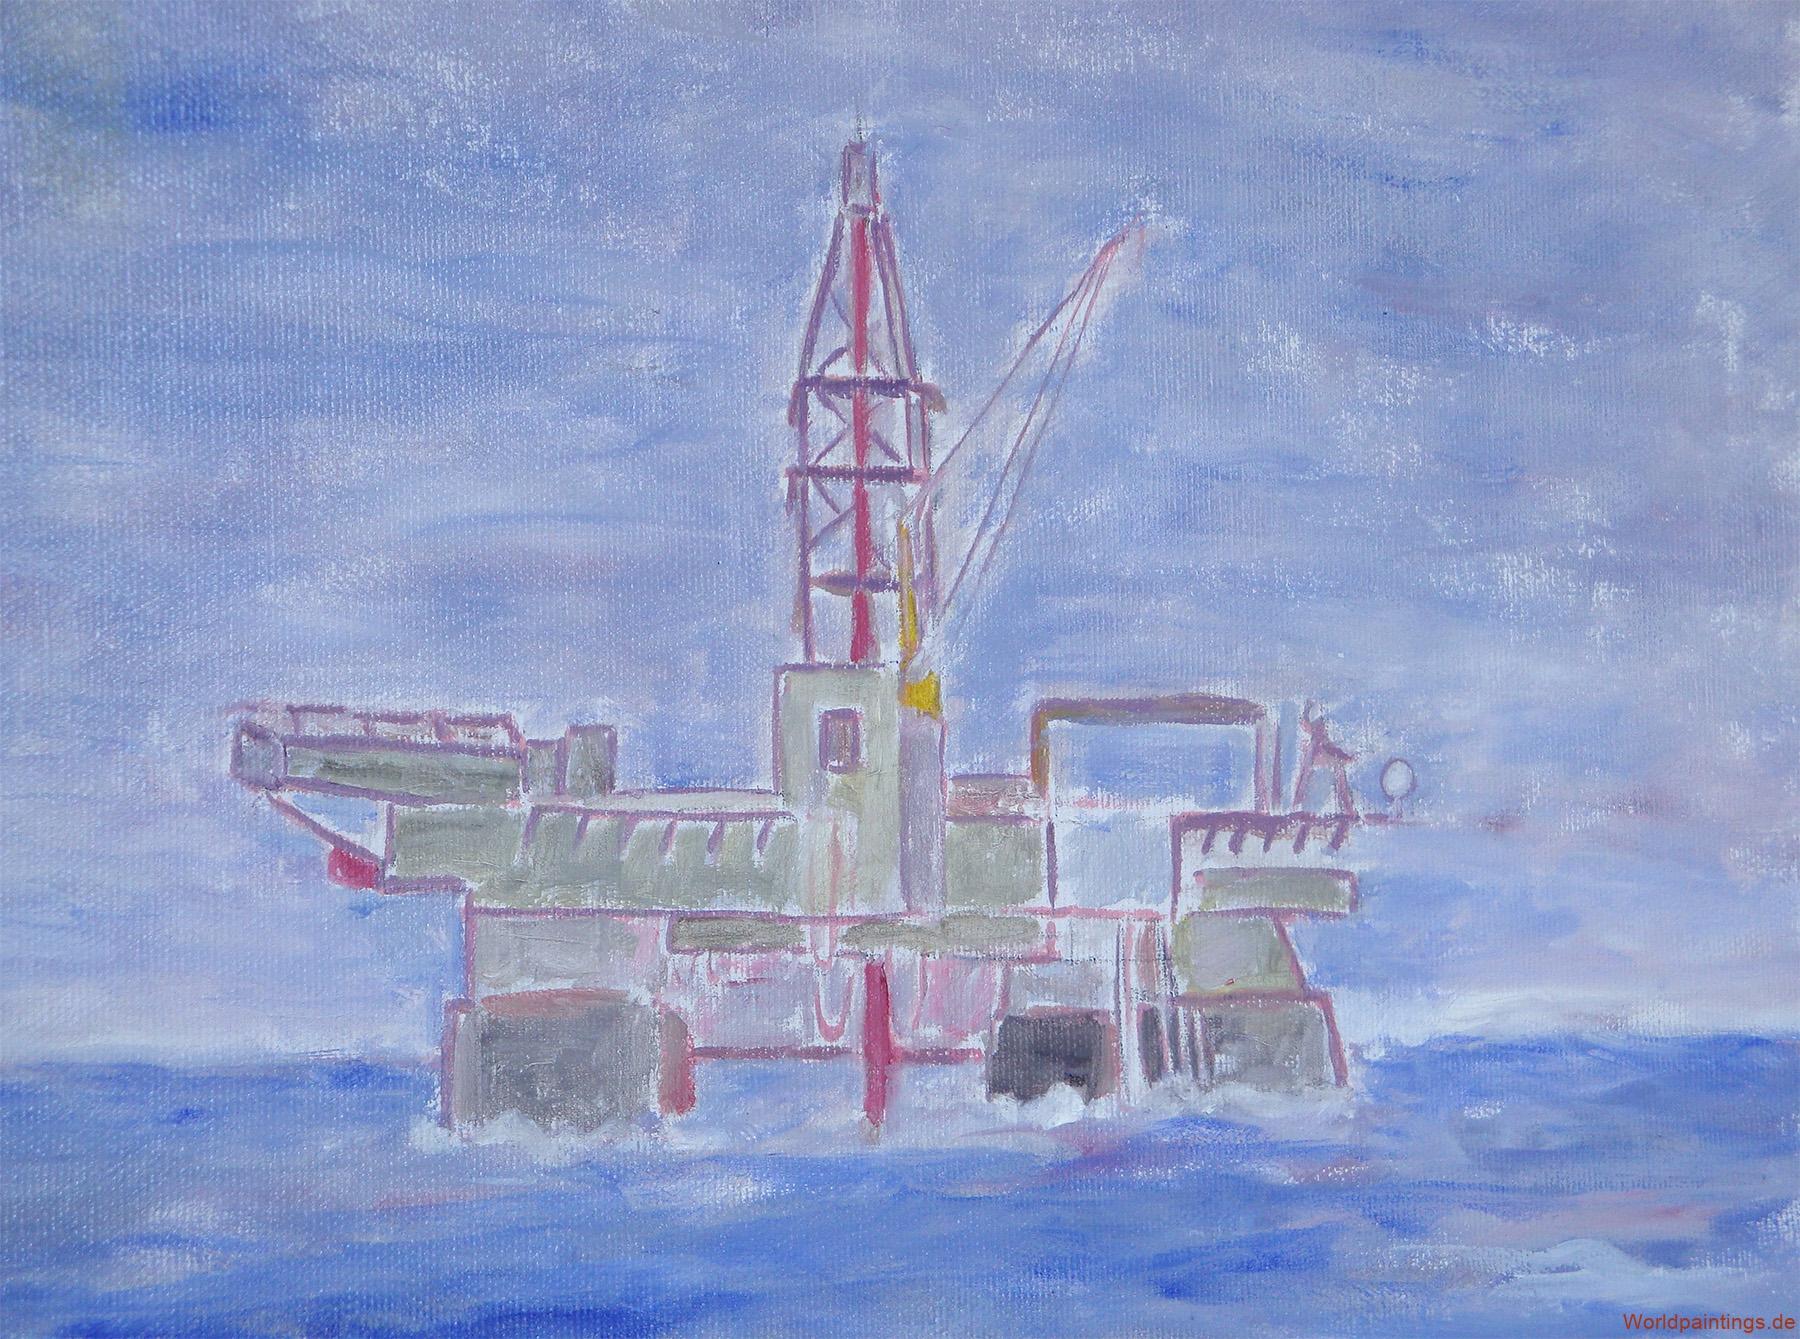 Bohrinsel Deepwater Horizon